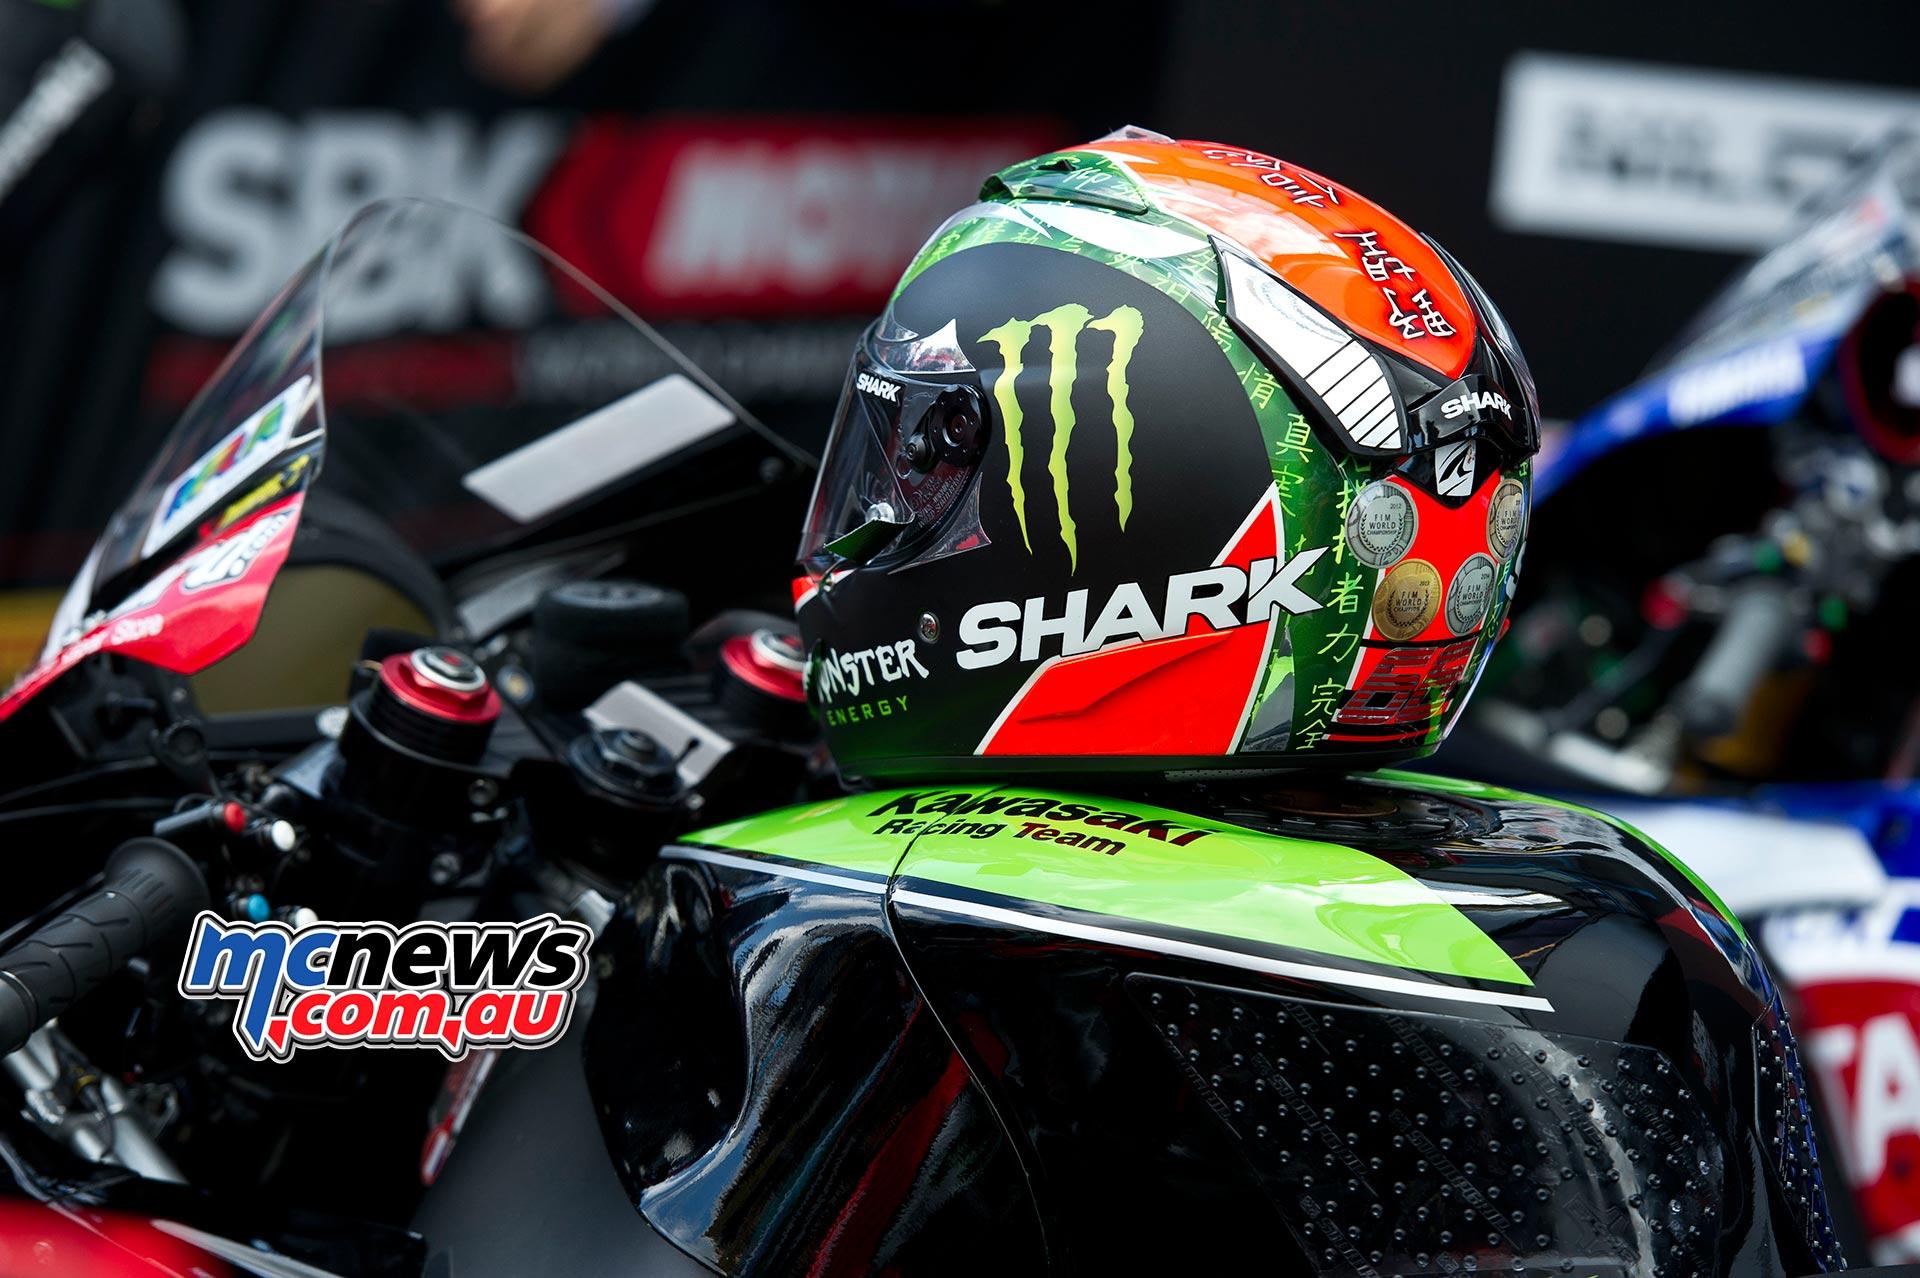 Tom Sykes - Shark Helmet